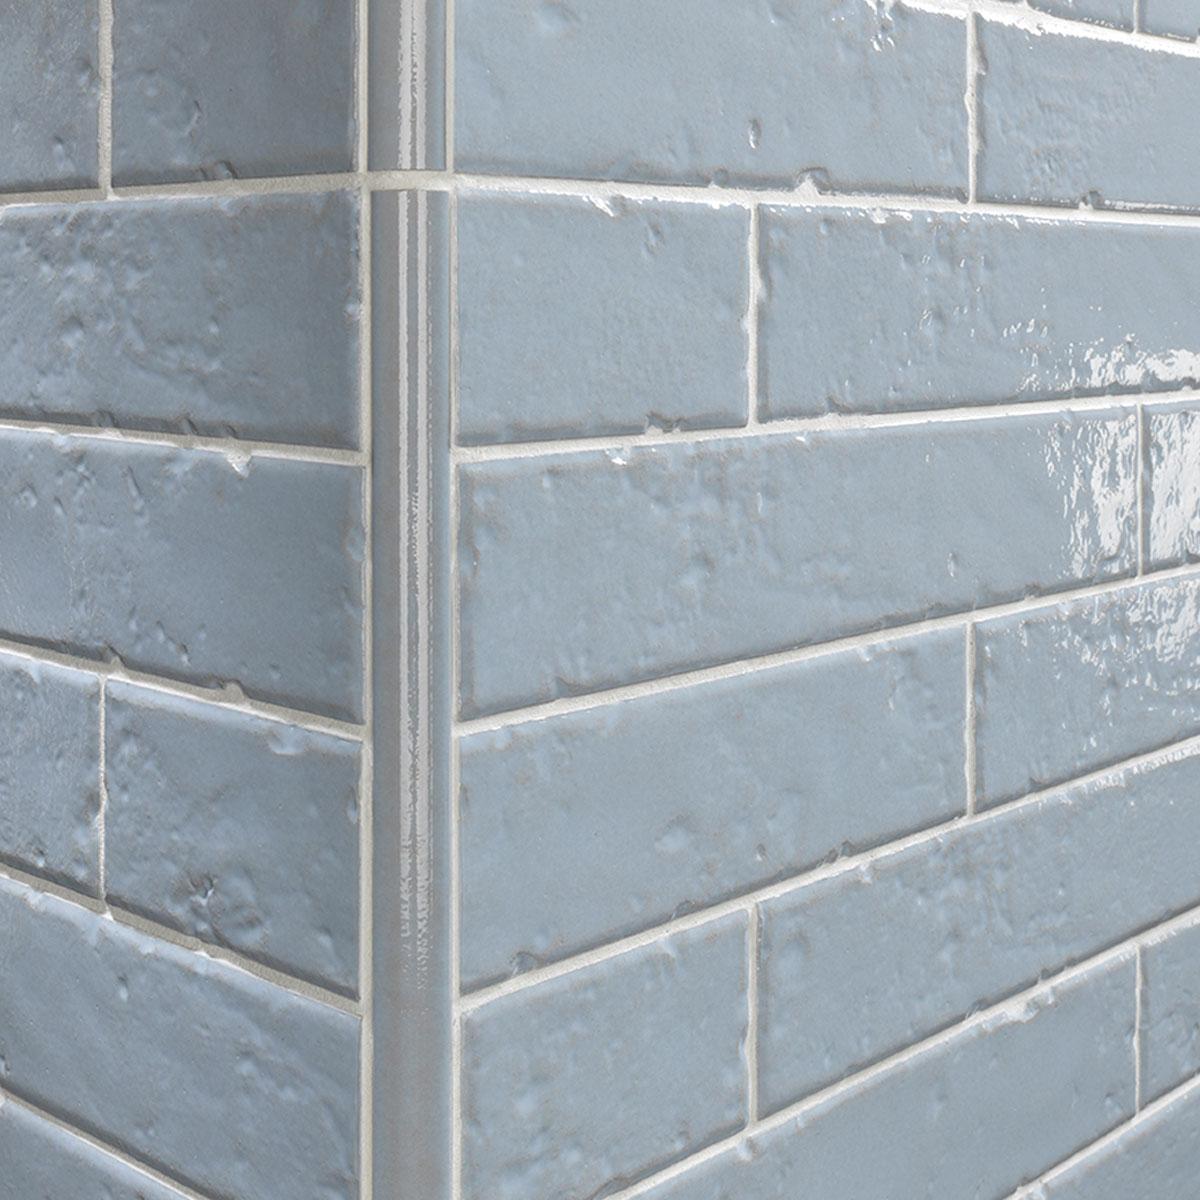 Brickart - gloss - seagrass - subway tile - Stone3 Brisbane